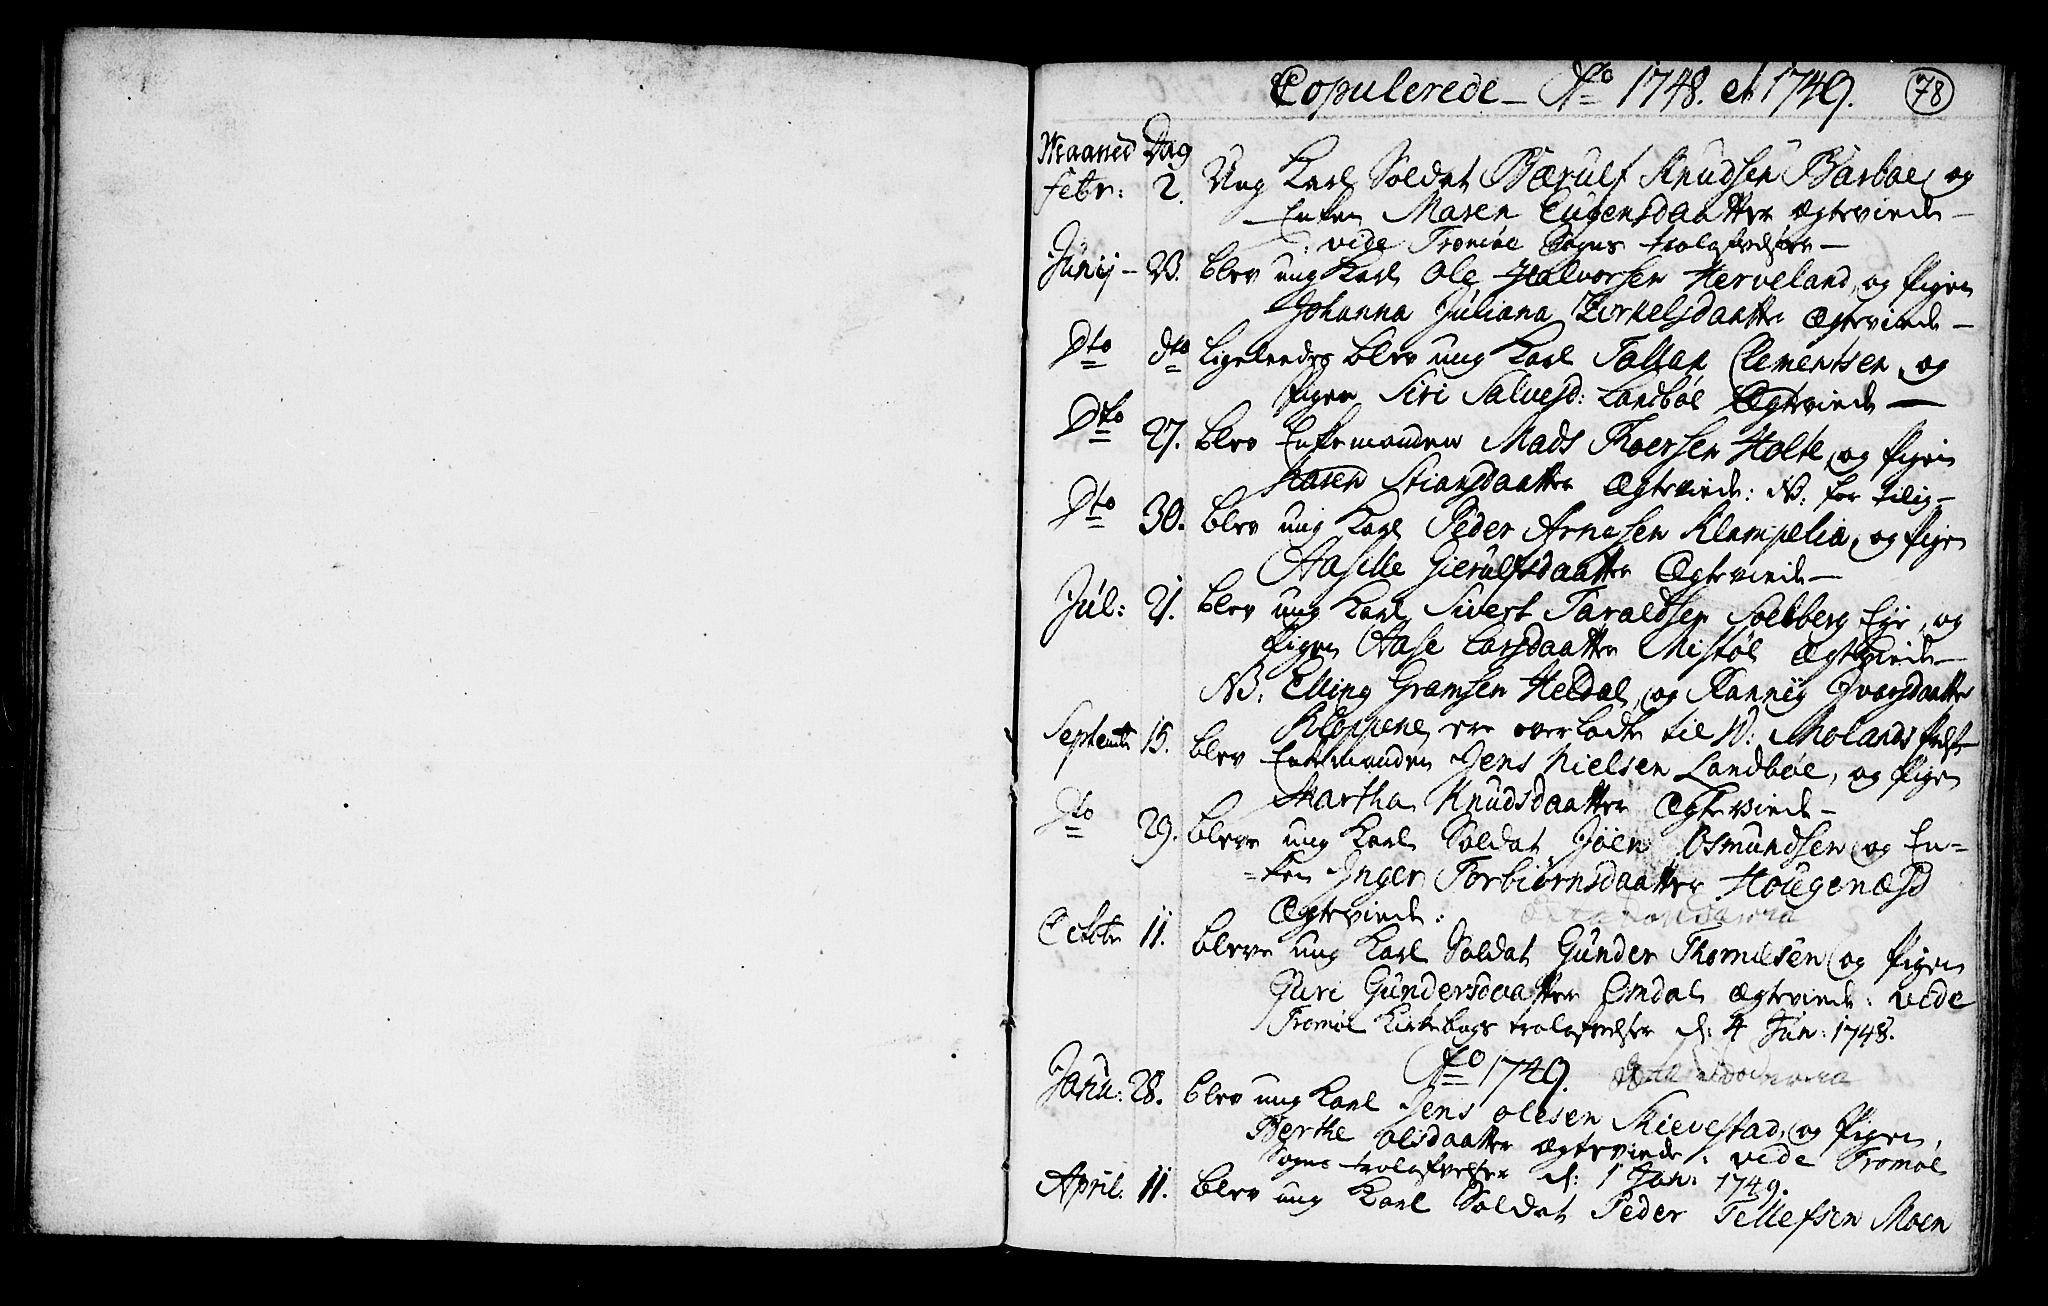 SAK, Austre Moland sokneprestkontor, F/Fa/Faa/L0001: Ministerialbok nr. A 1, 1747-1764, s. 78